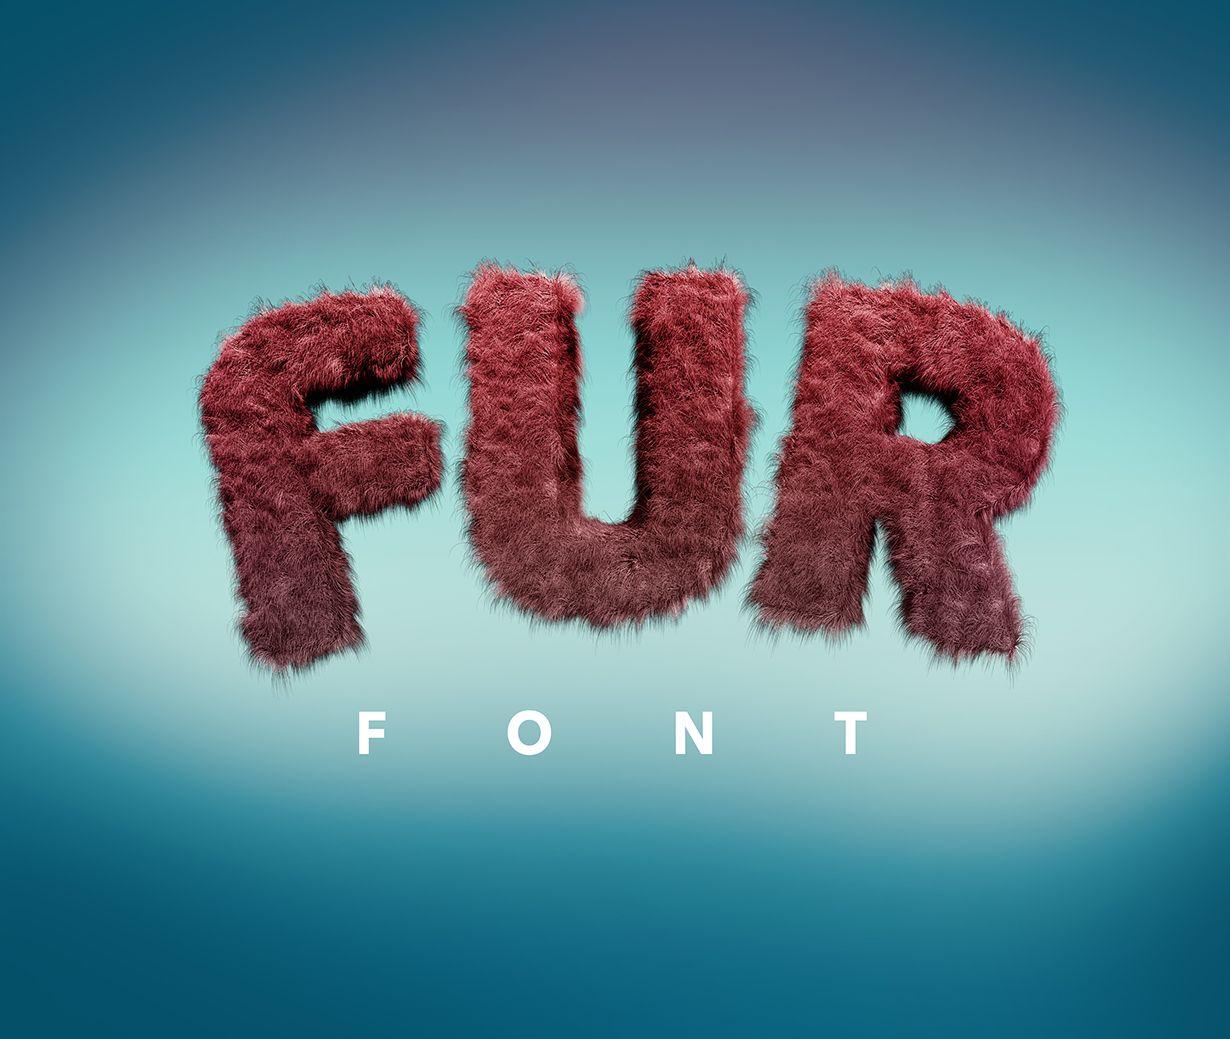 Fur Font Gk Mockups Store Textured Lettering Creative Fonts Creative Sketches